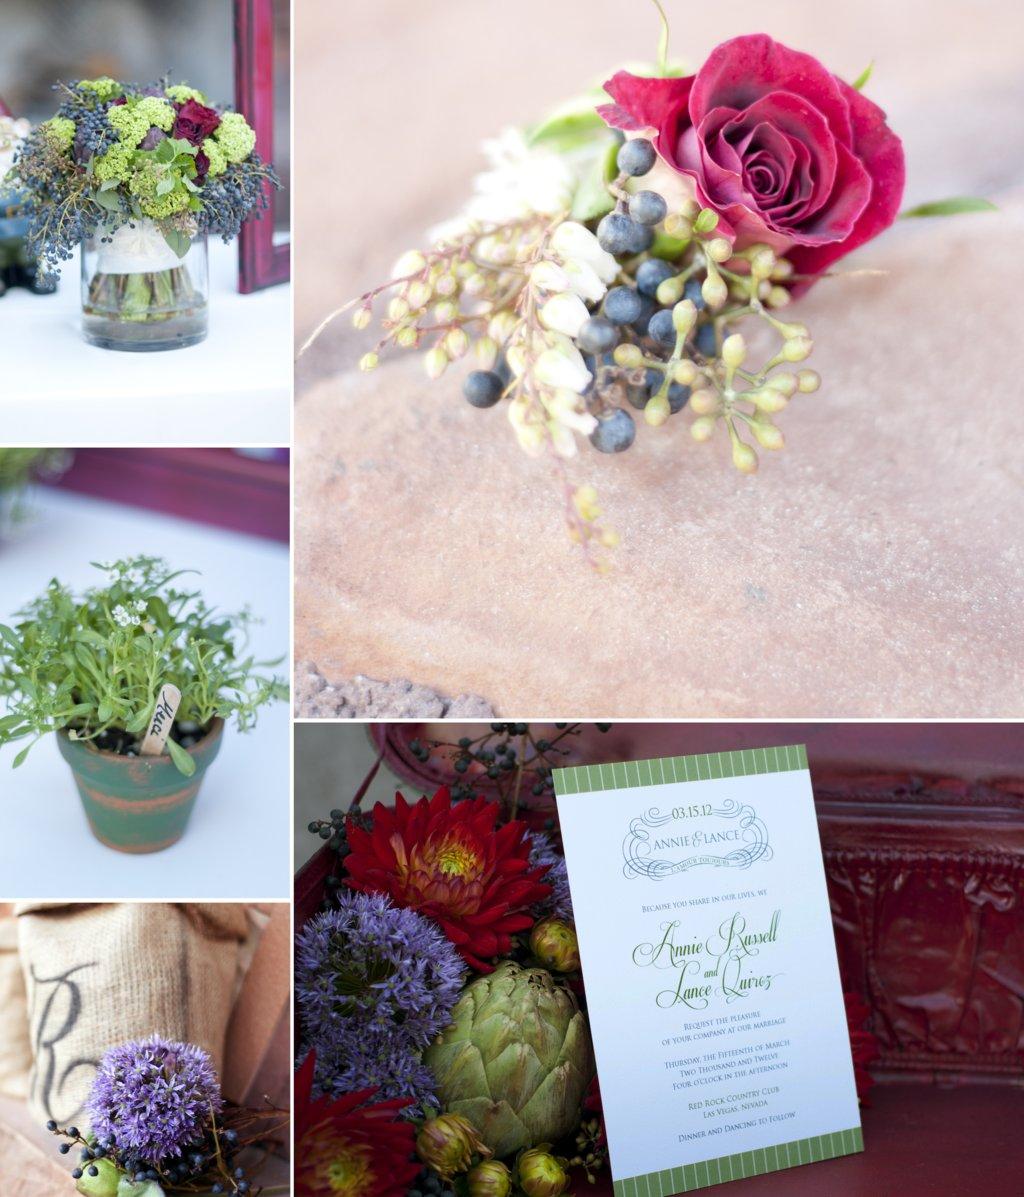 French-inspired-wedding-inspiration-romantic-wedding-reception-decor-1.full